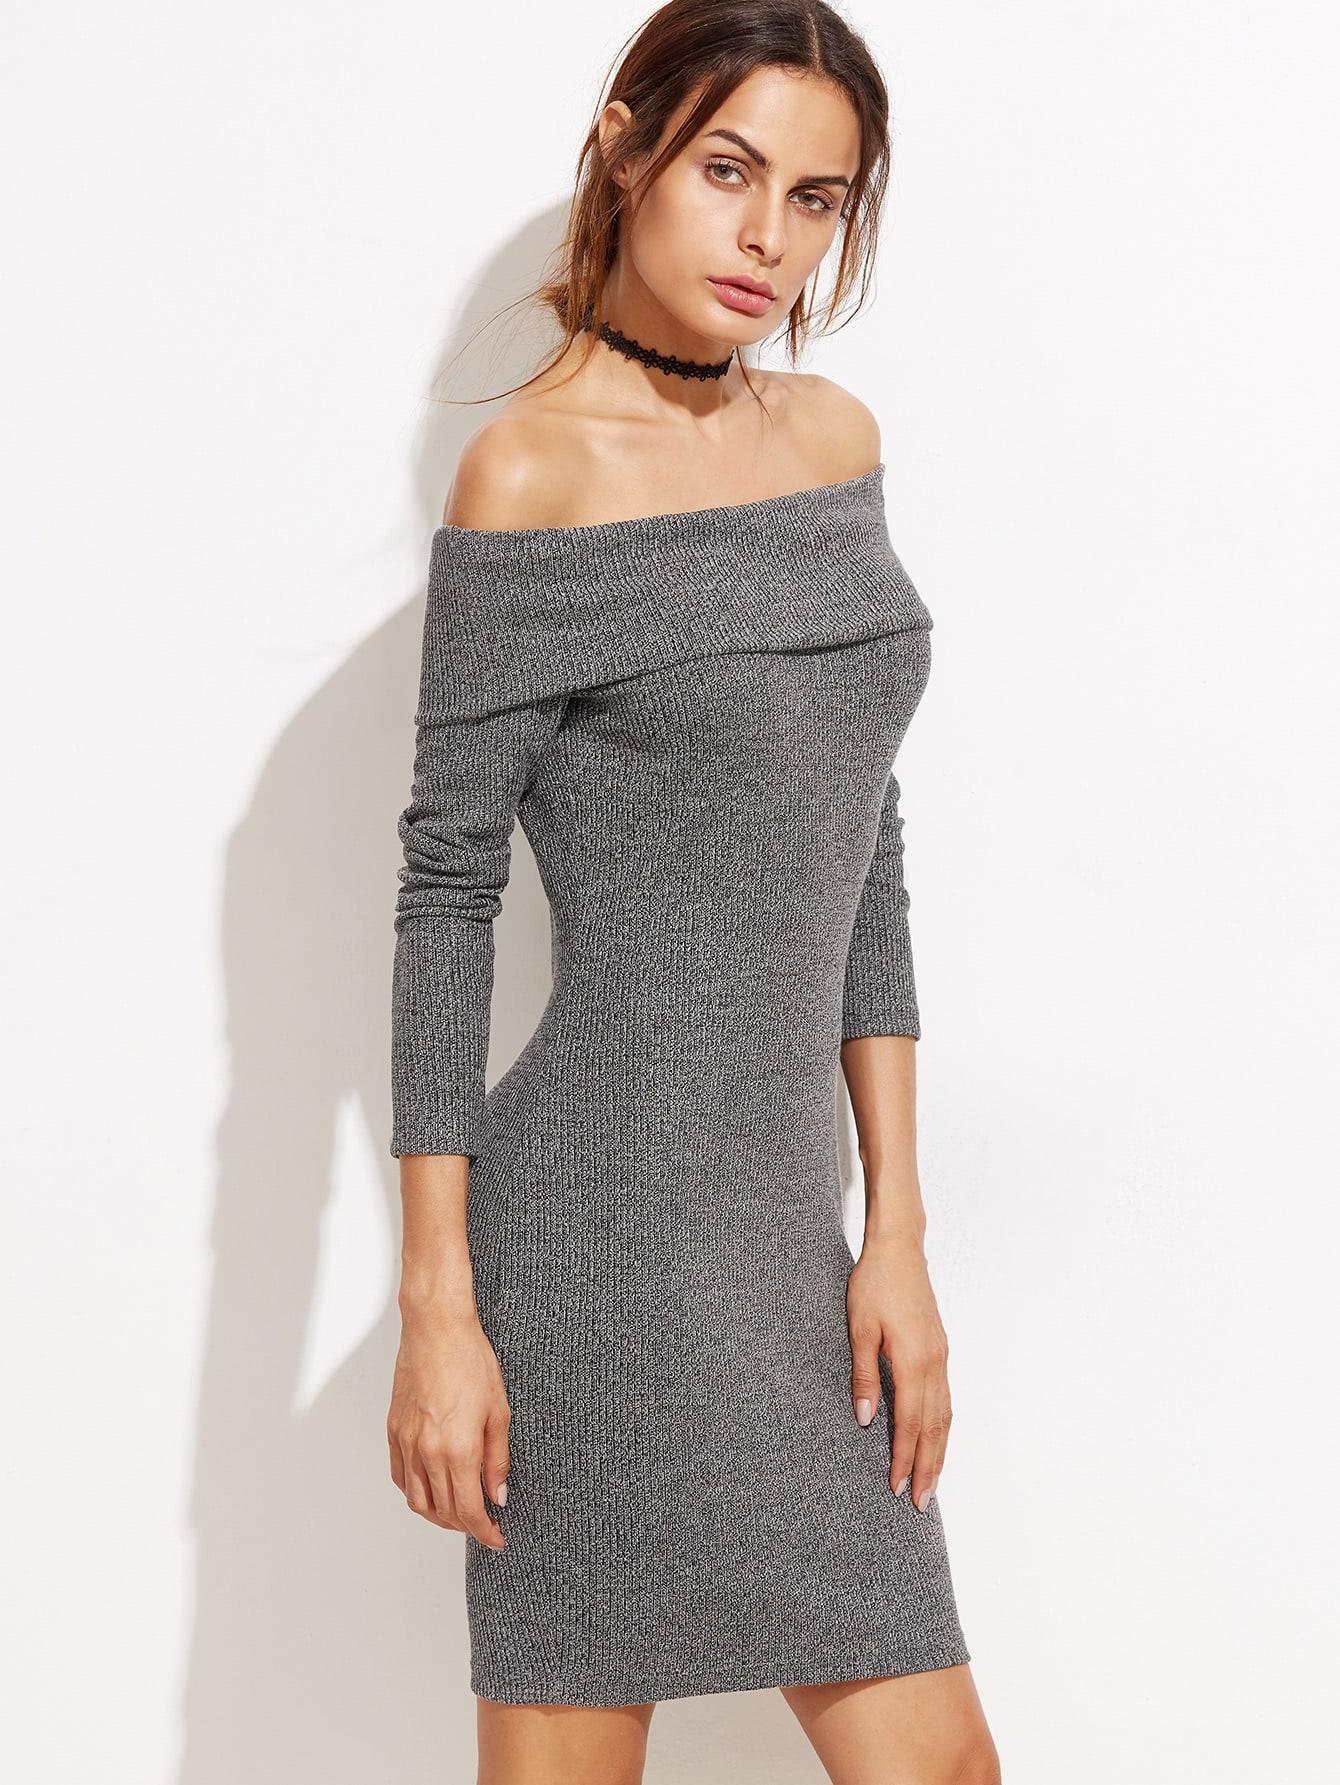 Heather Grey Foldover Off The Shoulder Ribbed Dress dress160929707